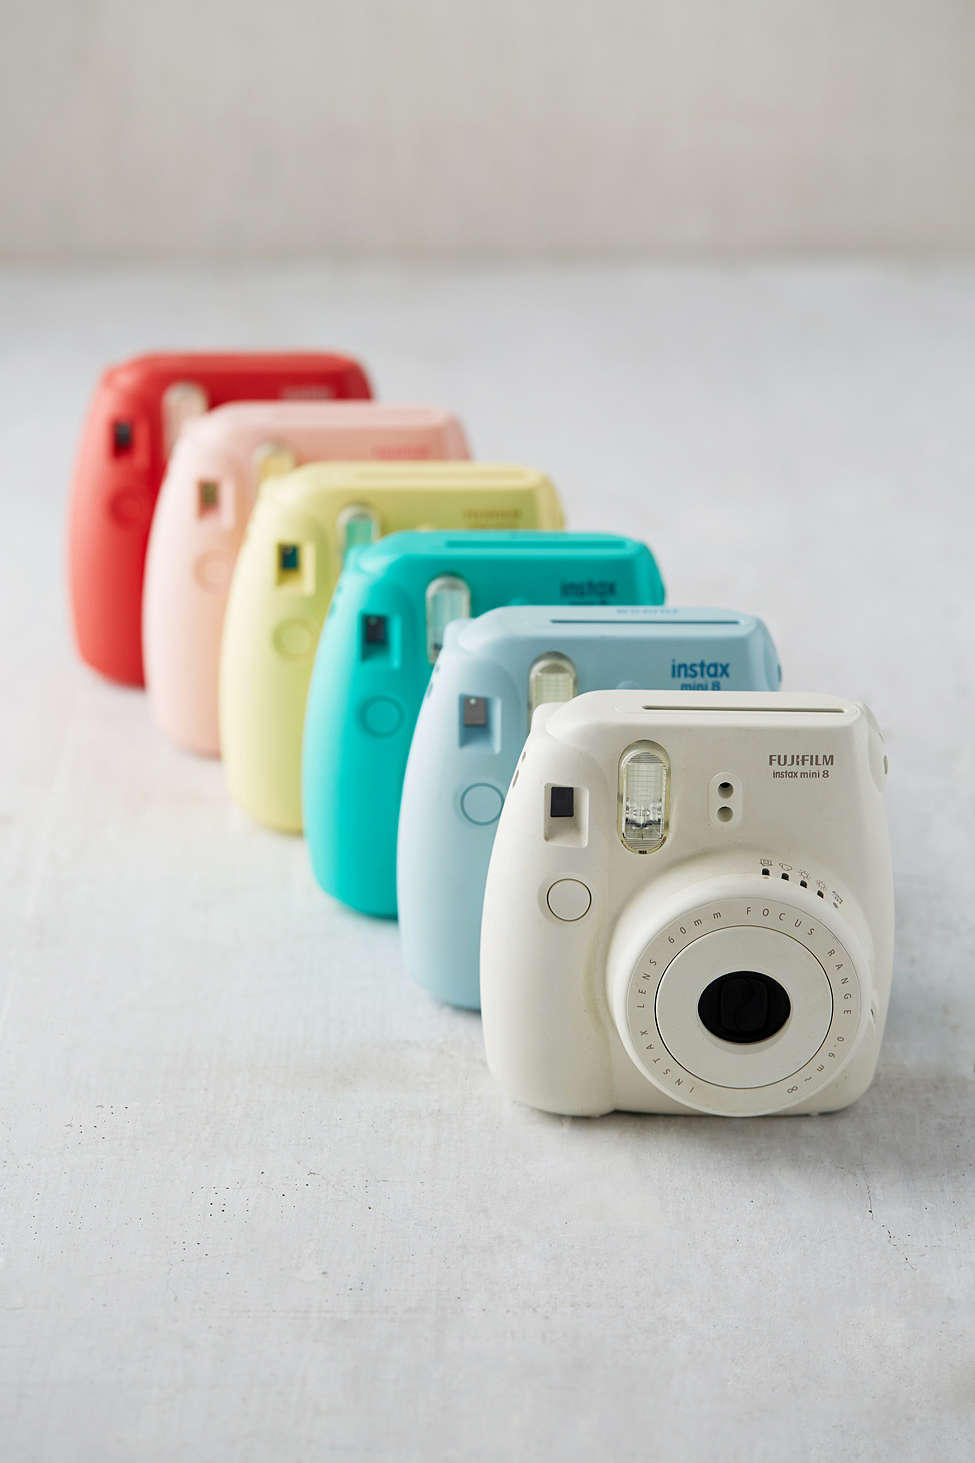 Urban Outfitters Fujifilm Instax Mini 8 Instant Camera $70; image via